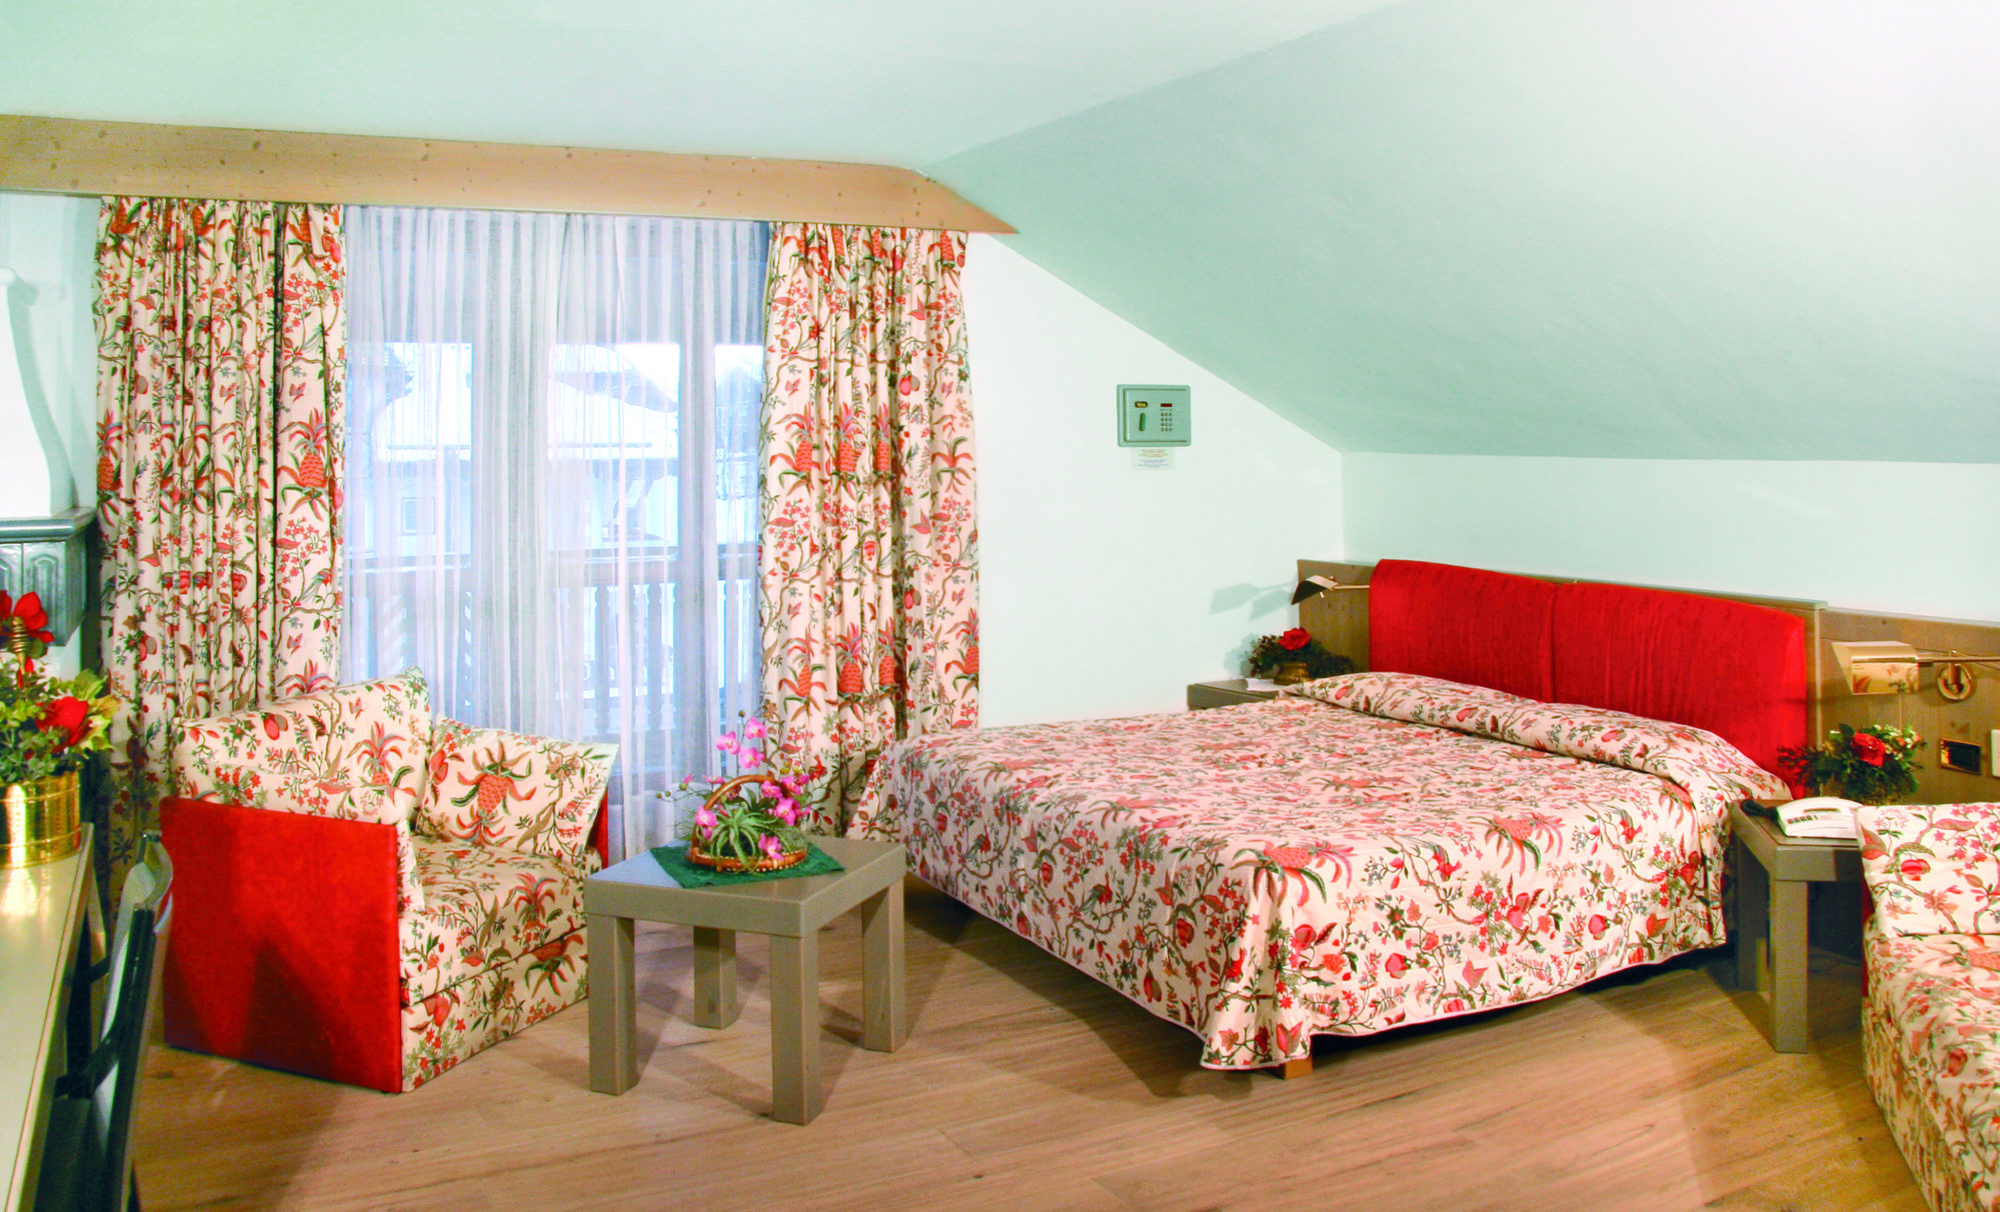 16 Hotel Rubino - Room